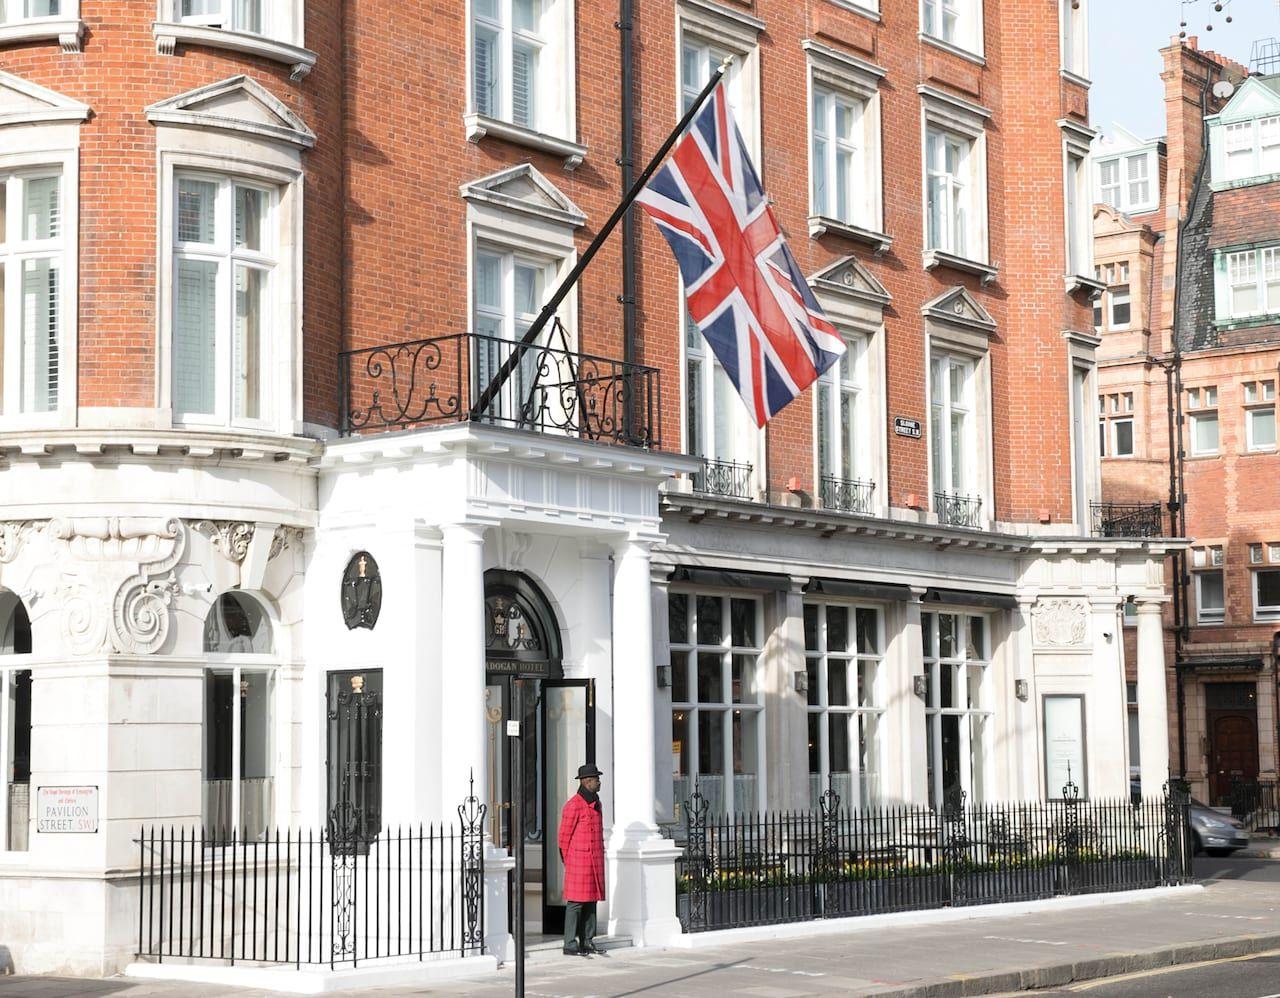 Belmond Hotel London - Spring Travel